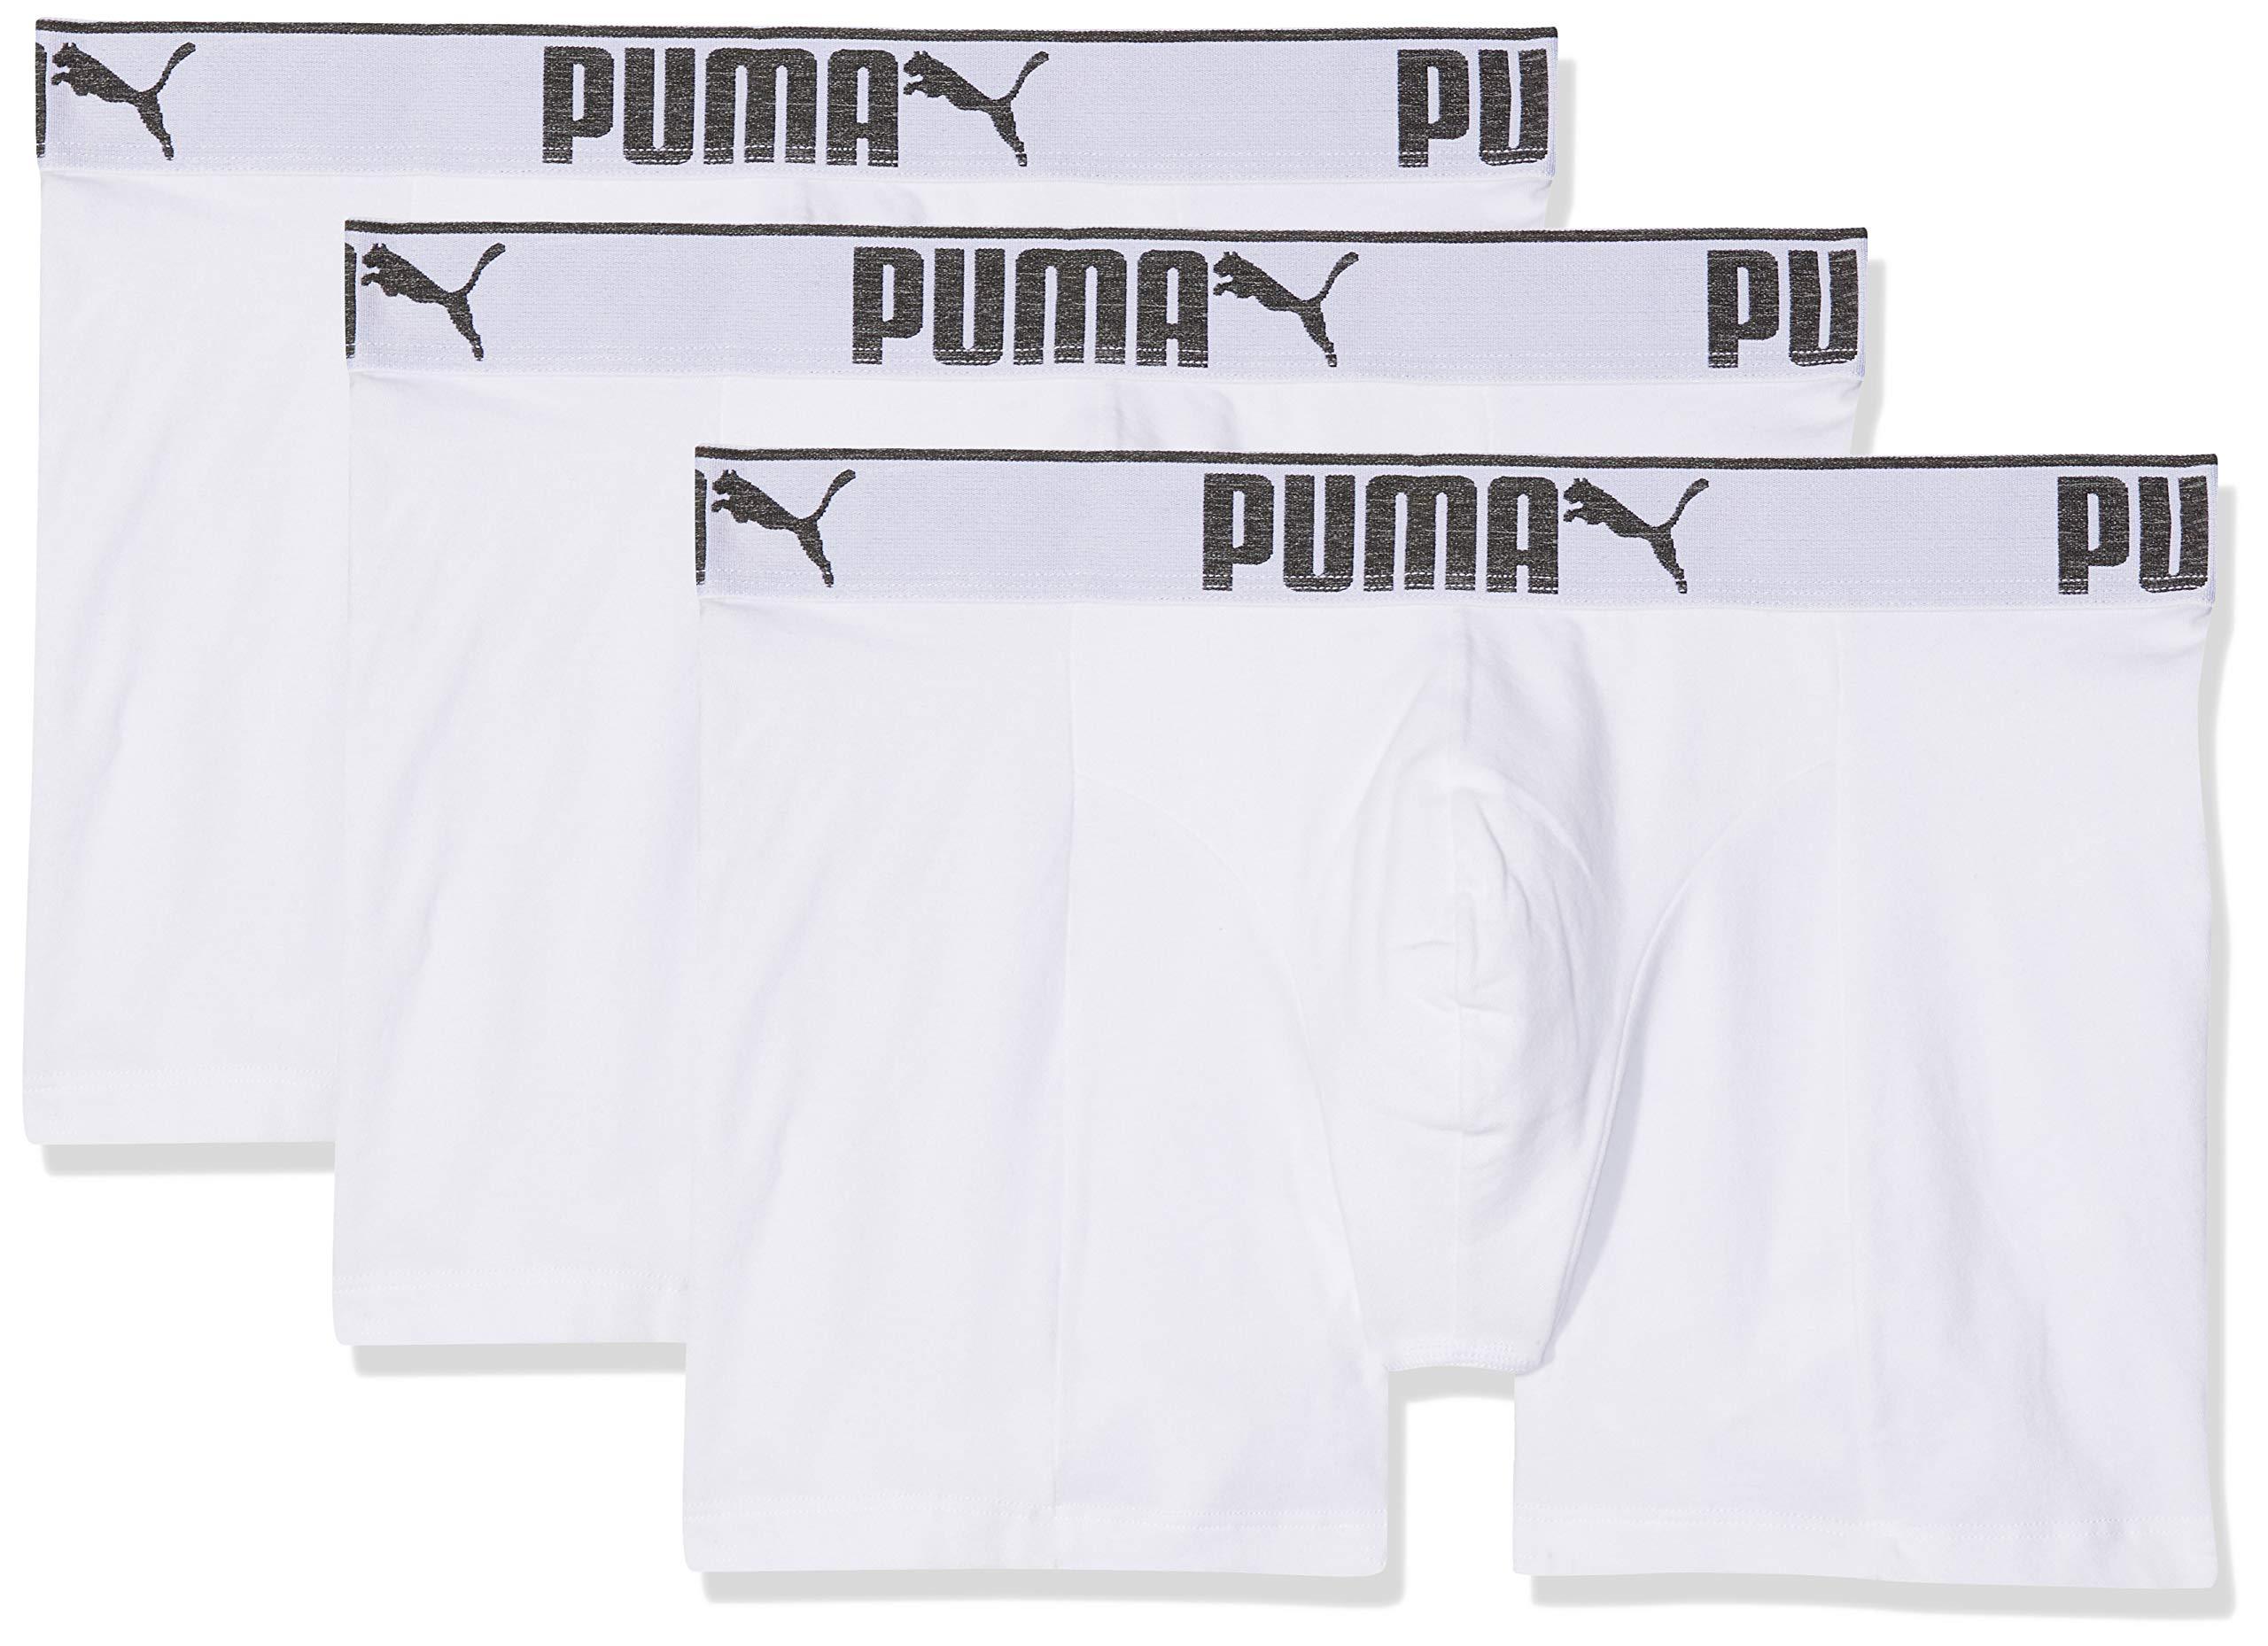 PUMA 3 x Mens Sueded Cotton Boxer Shorts White